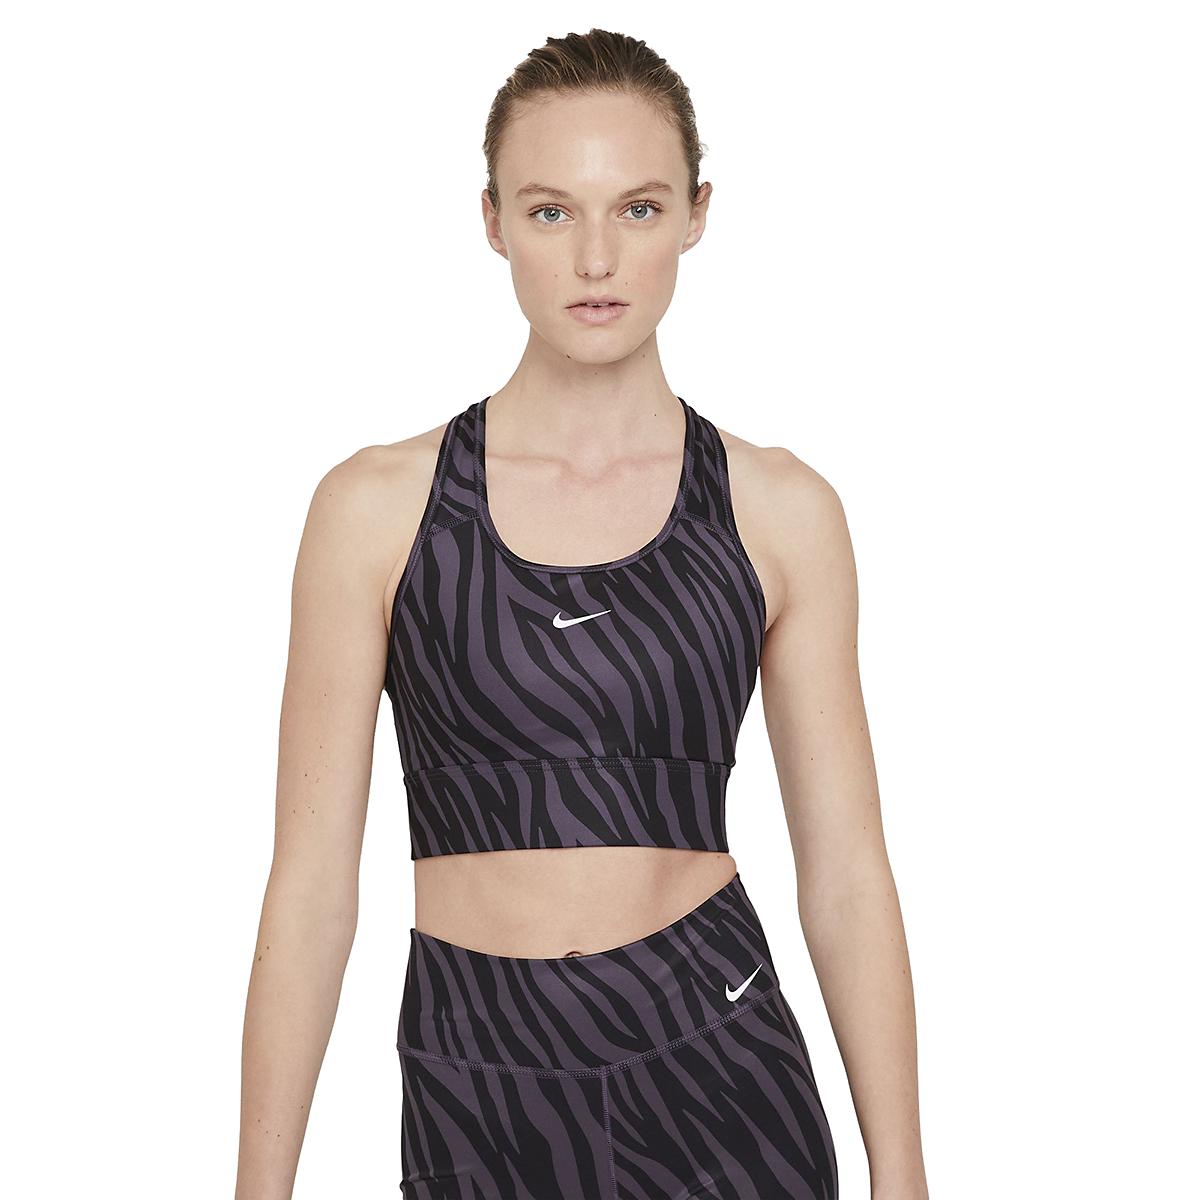 Women's Nike Dri-FIT Swoosh Icon Clash Bra - Color: Dark Raisin/White - Size: XS, Dark Raisin/White, large, image 1